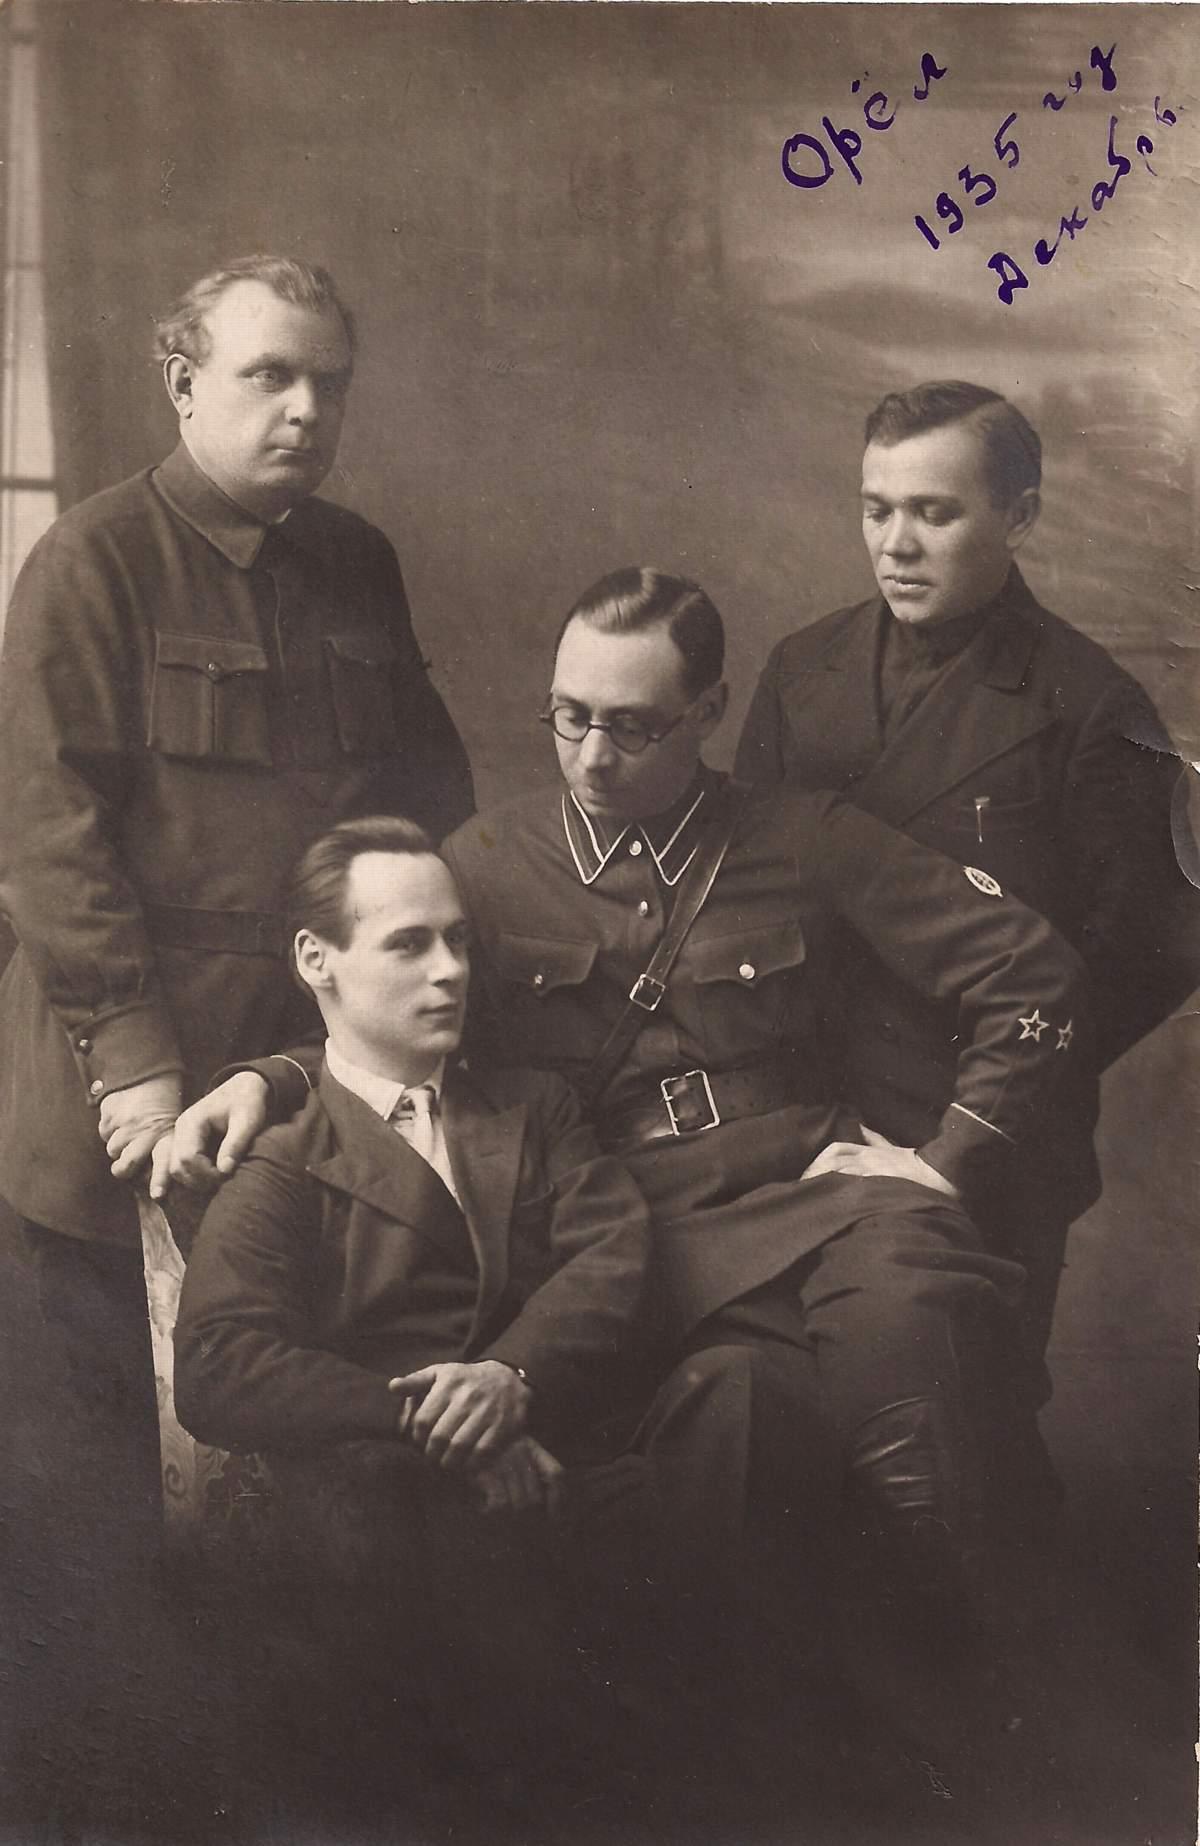 1935. НКВДшники. Орел